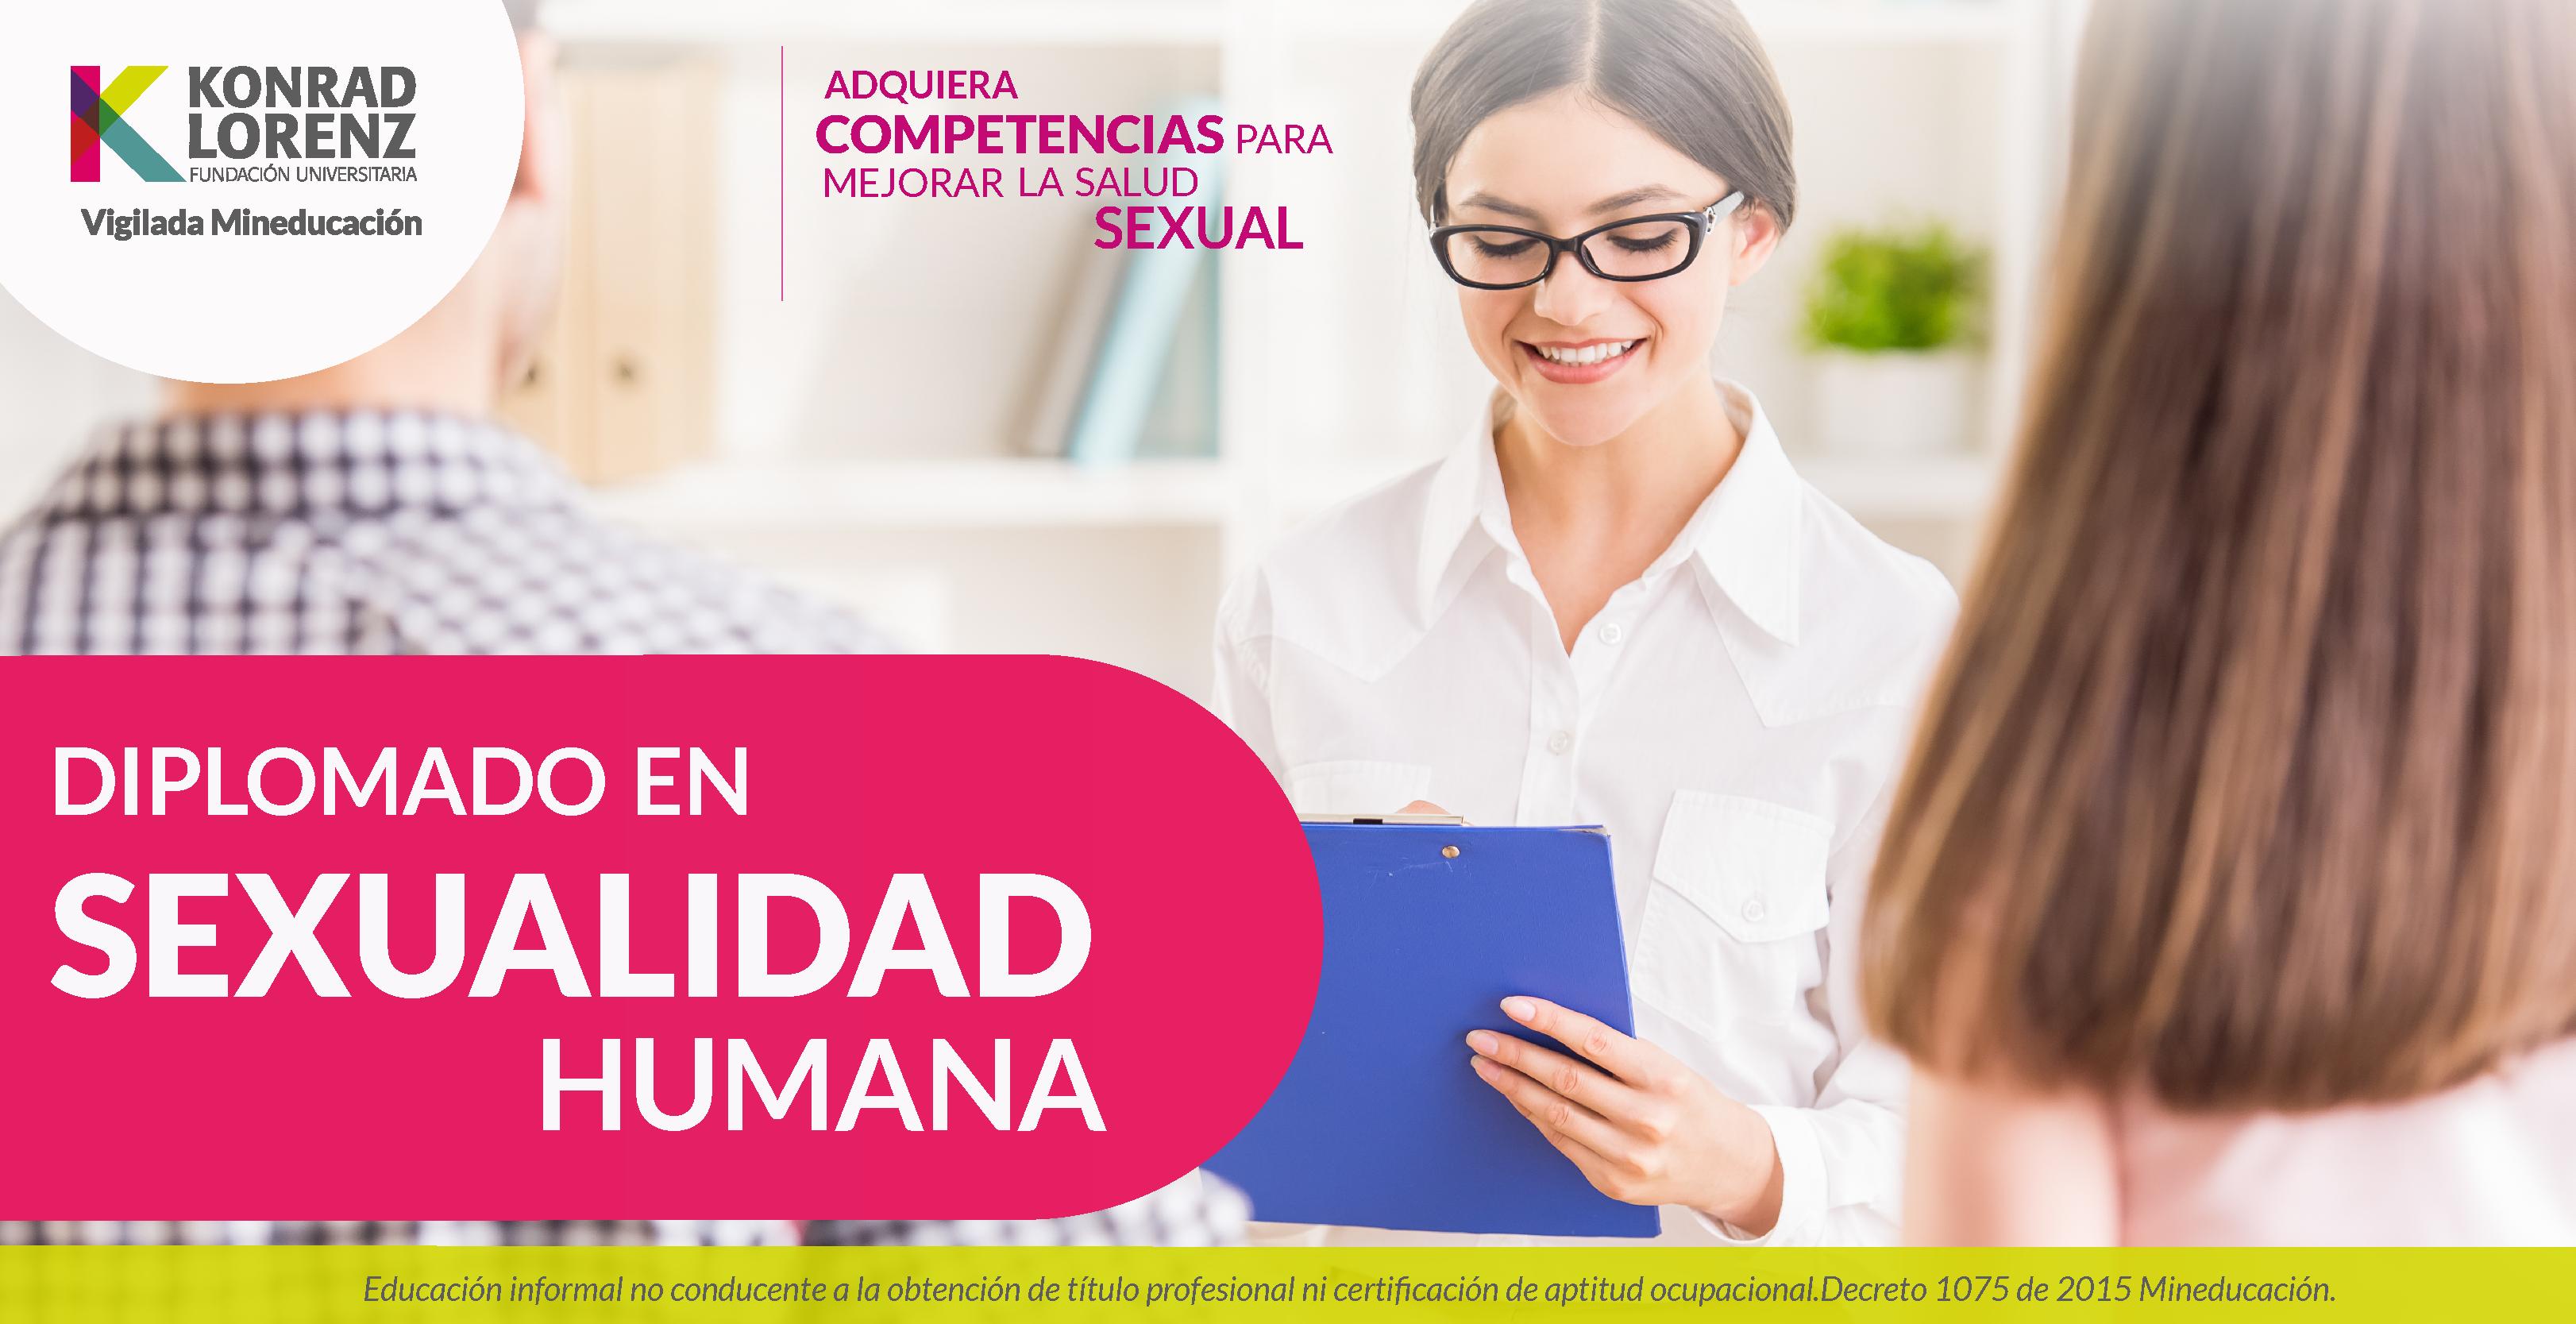 Diplomado en Sexualidad Humana